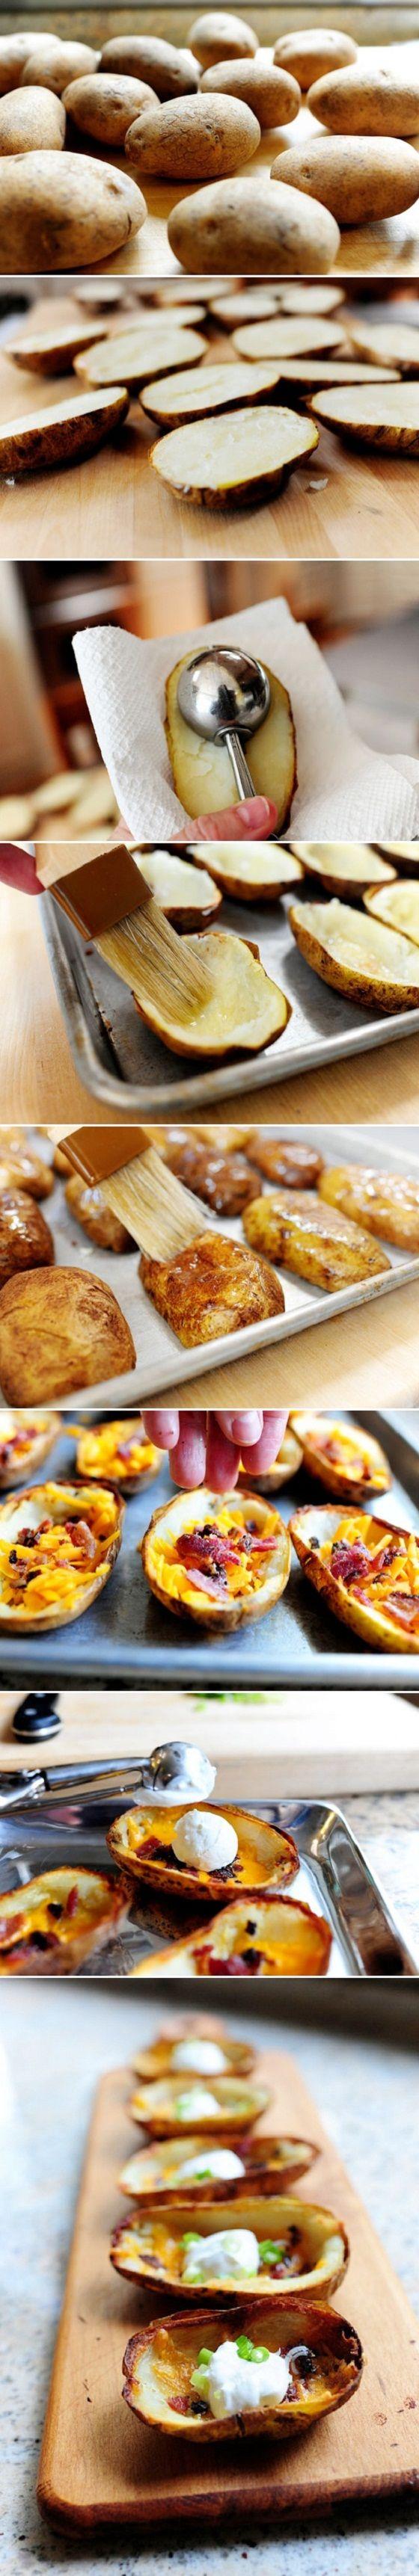 Loaded Baked Potato Skins